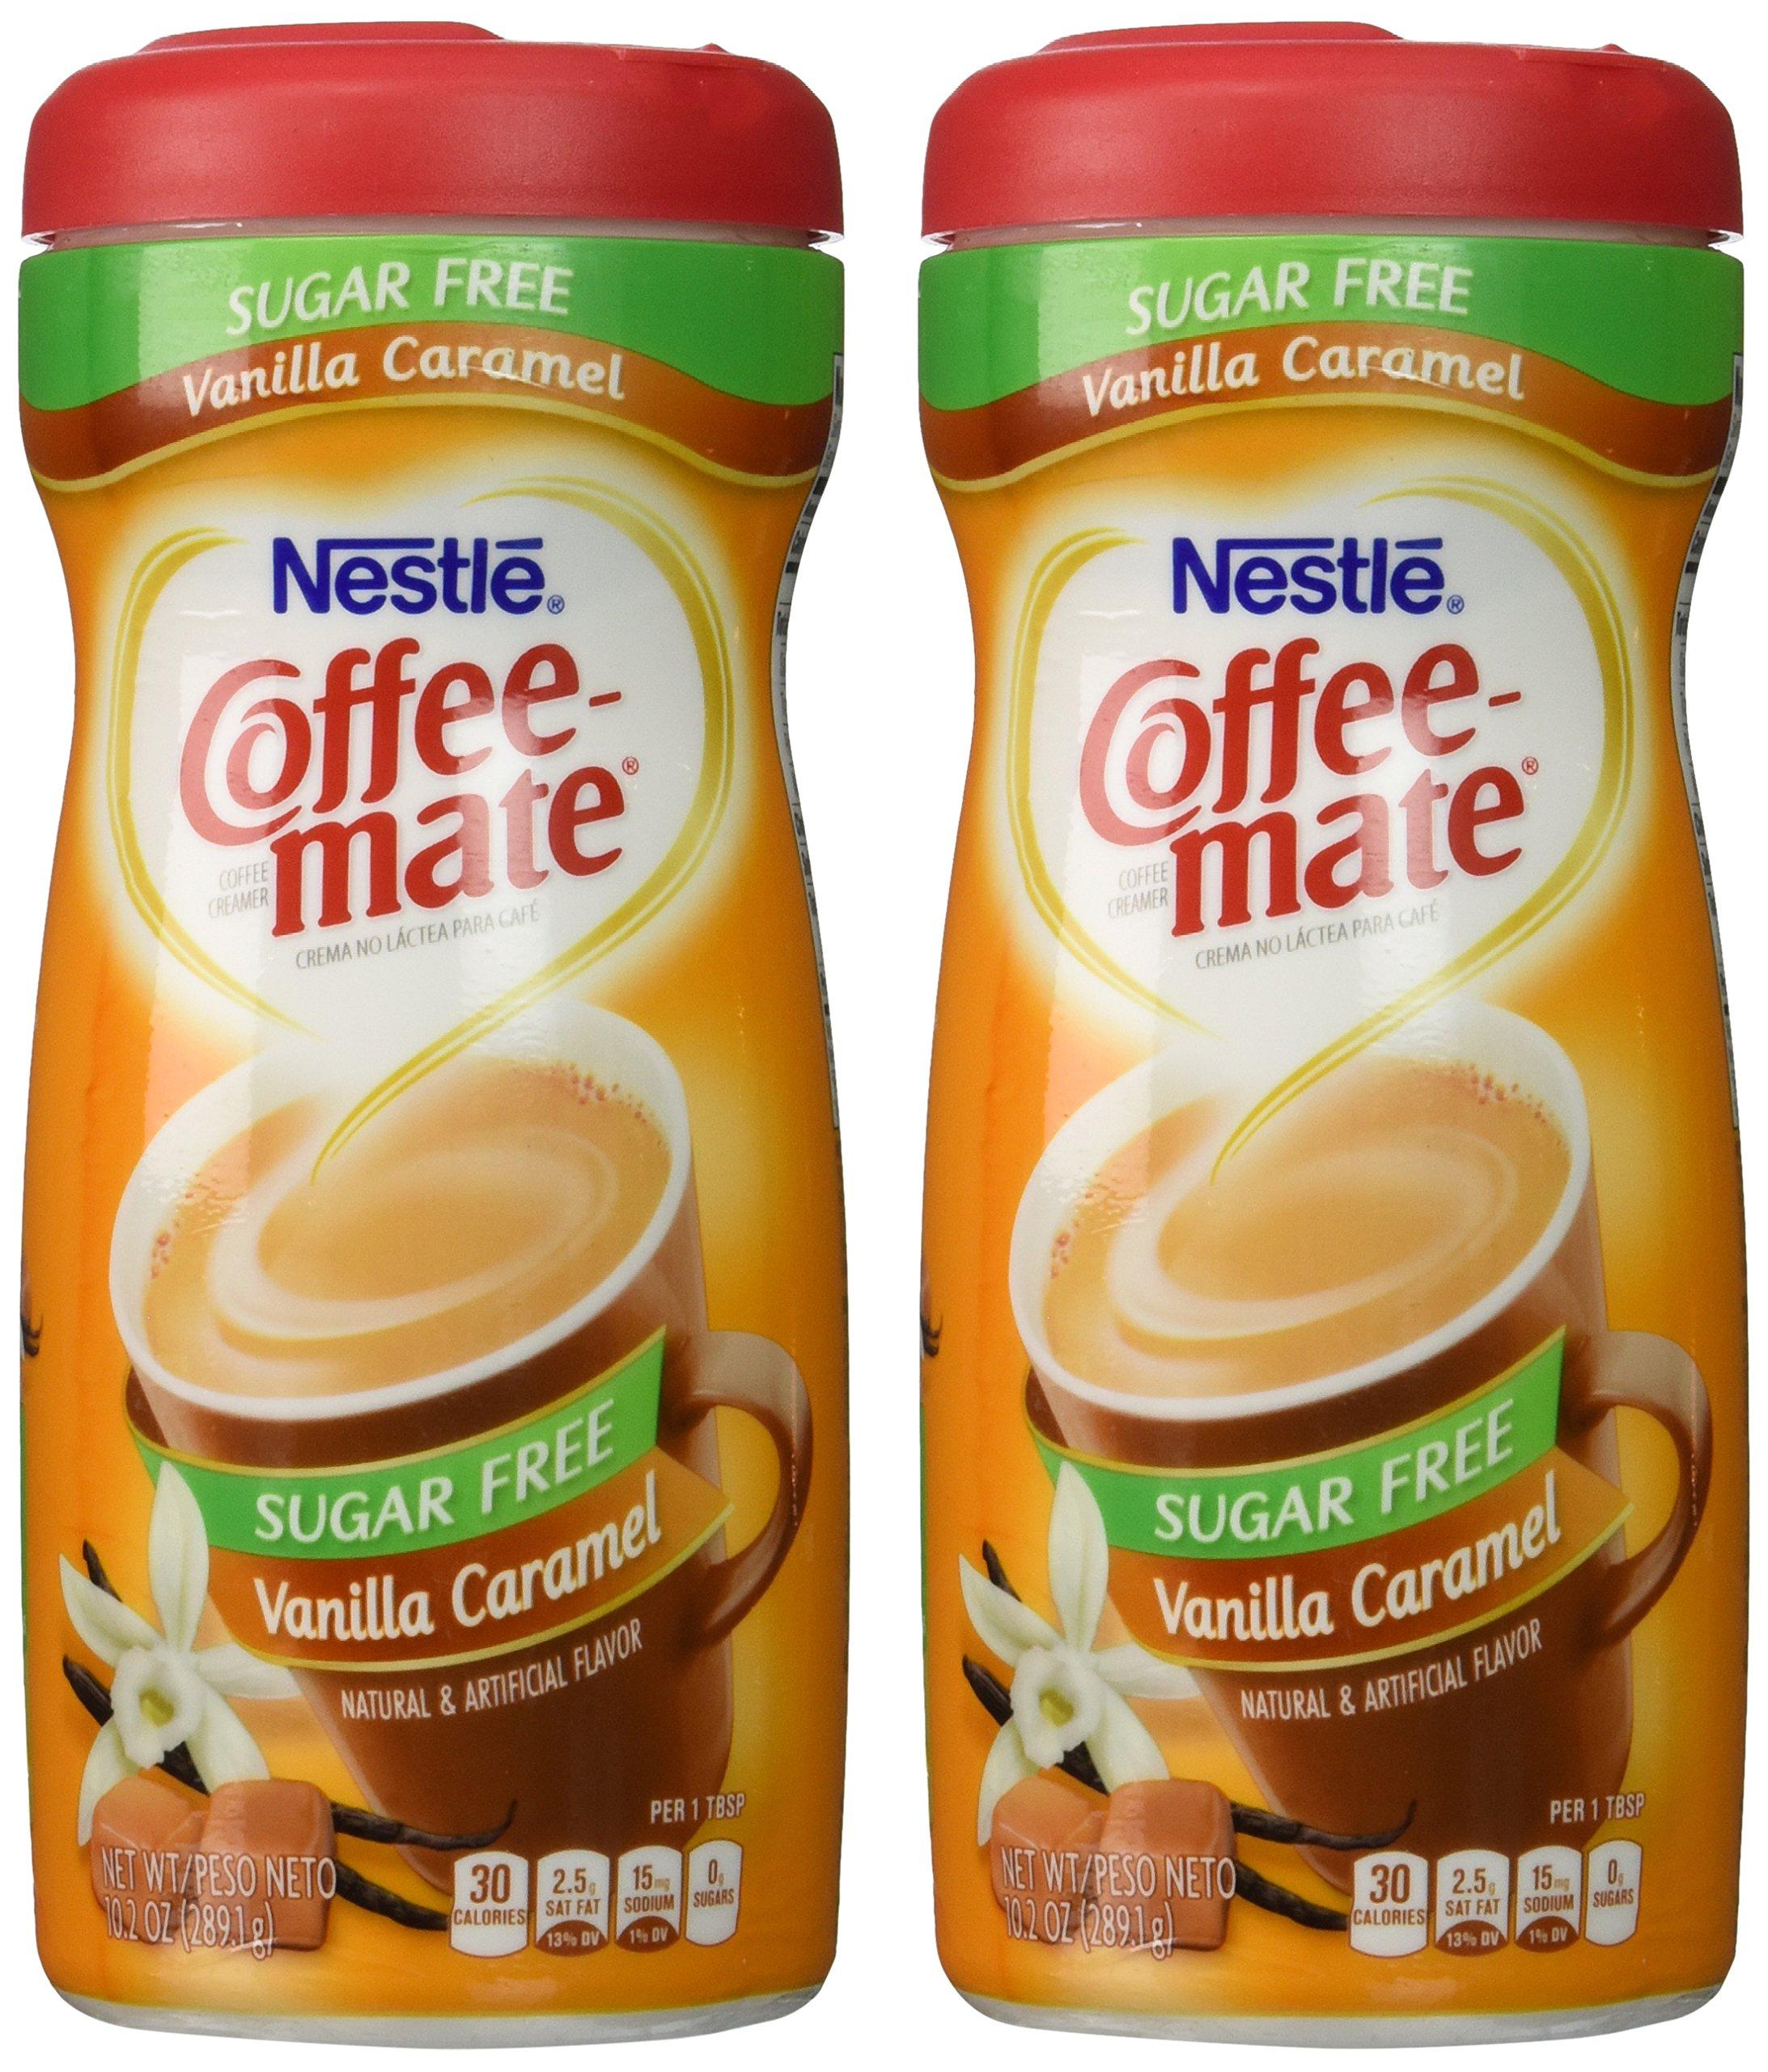 Coffee Mate Sugar Free - Vanilla Caramel Flavoured Coffee Whitener - Powder Creamer for Coffee, 289grams (Pack of 2)